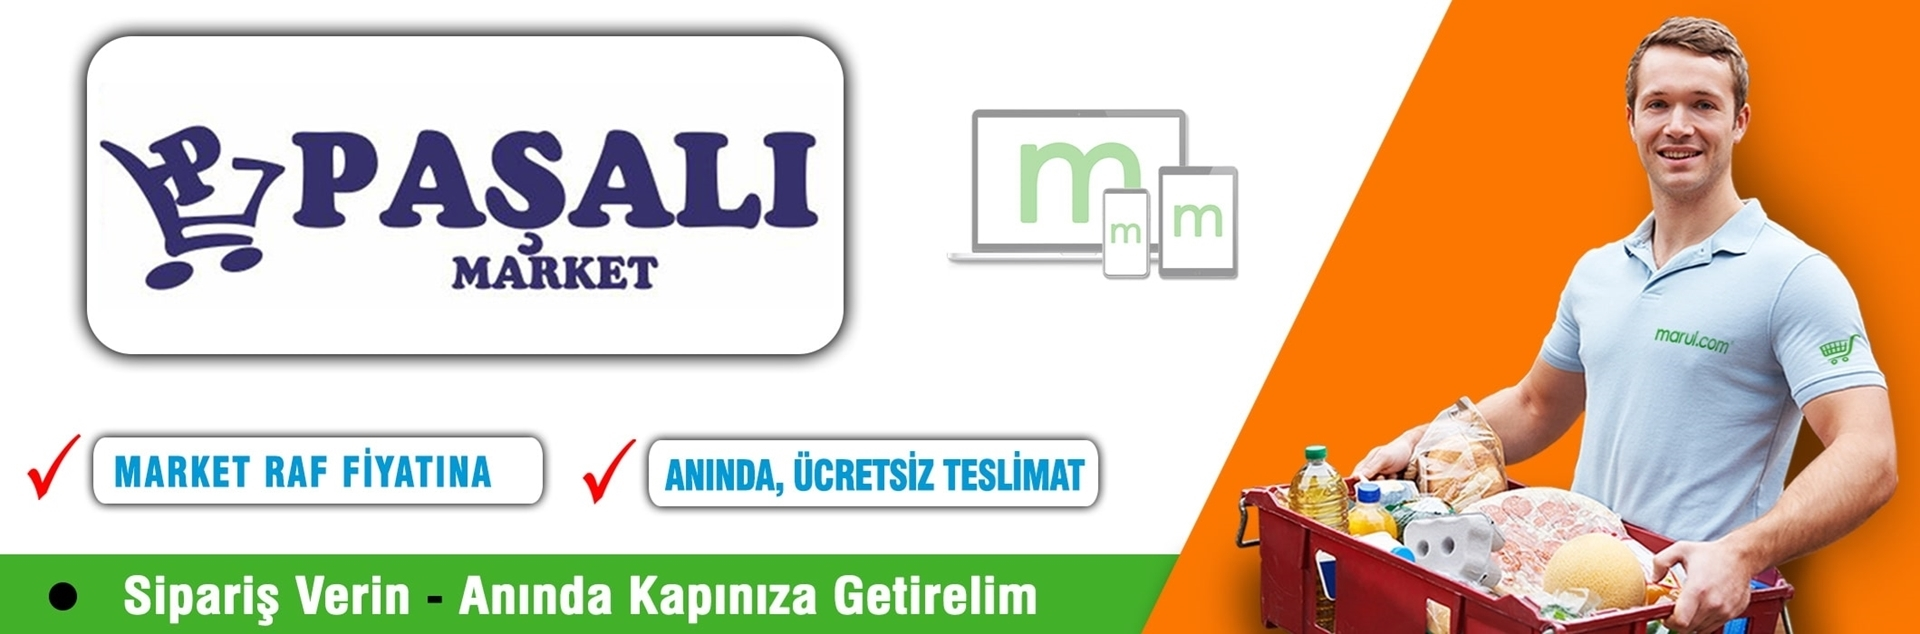 paşalı market online market siparişi